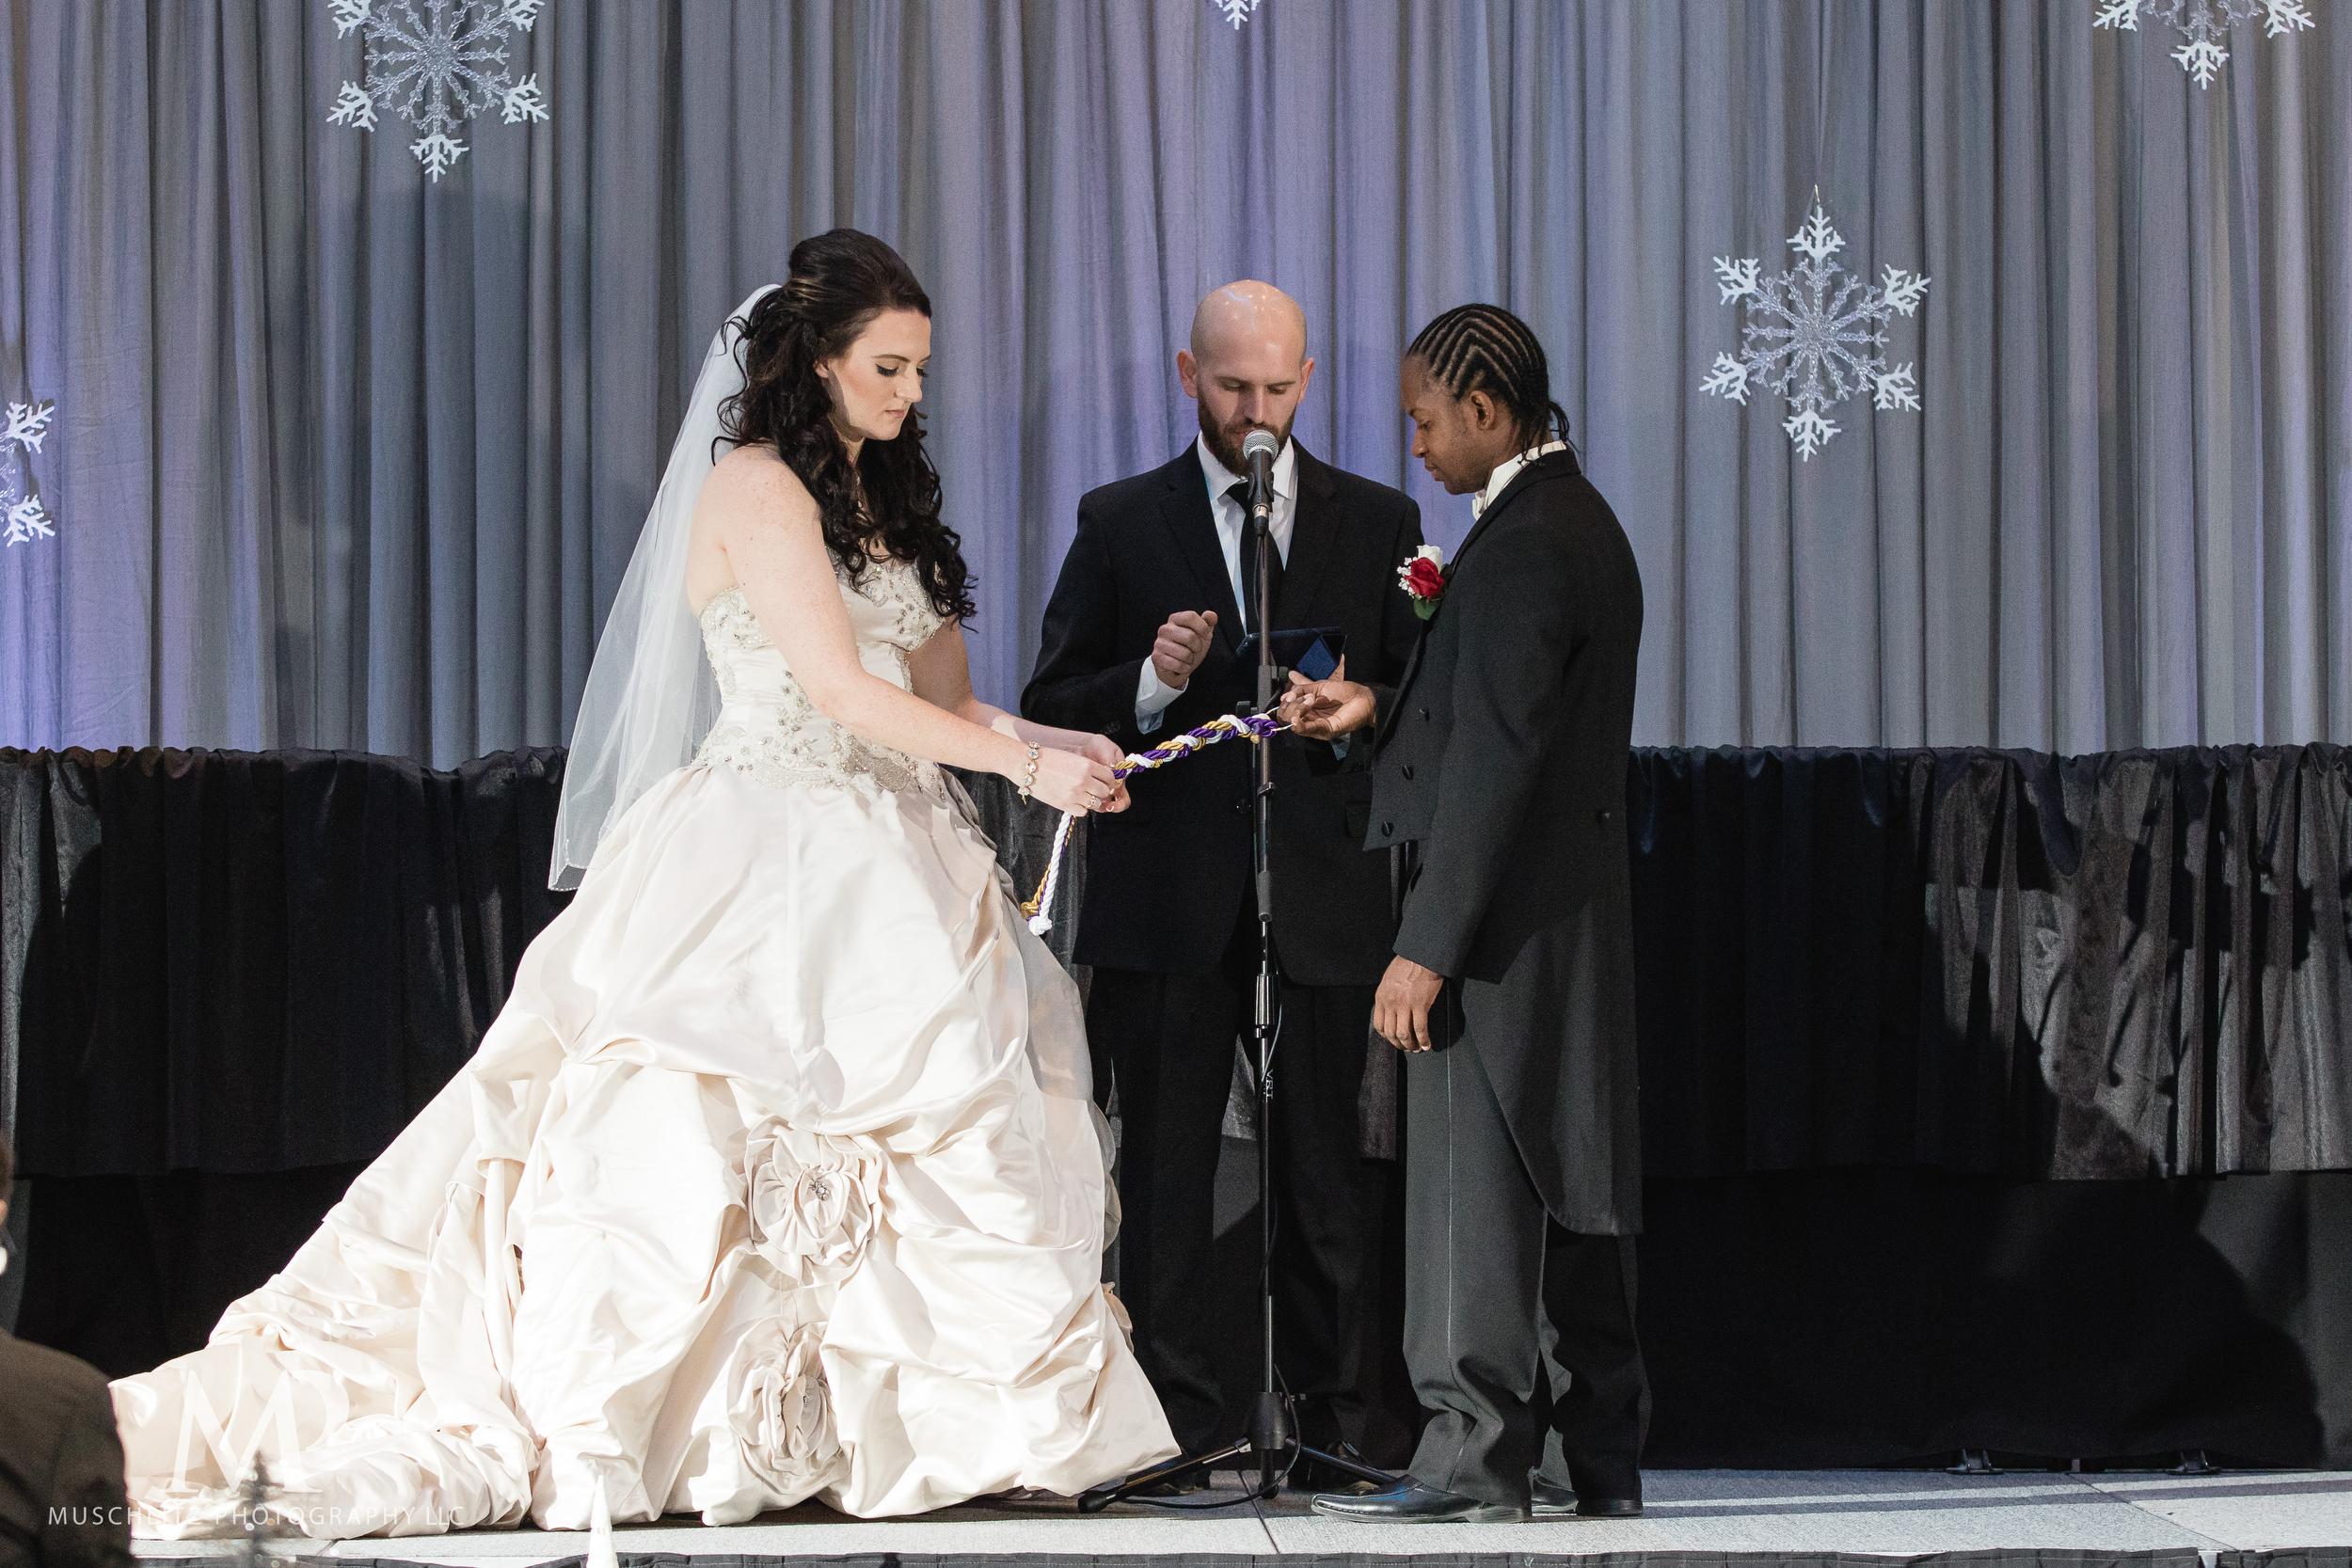 greater-columbus-convention-center-winter-wedding-ceremony-reception-portraits-columbus-ohio-muschlitz-photography-027.JPG